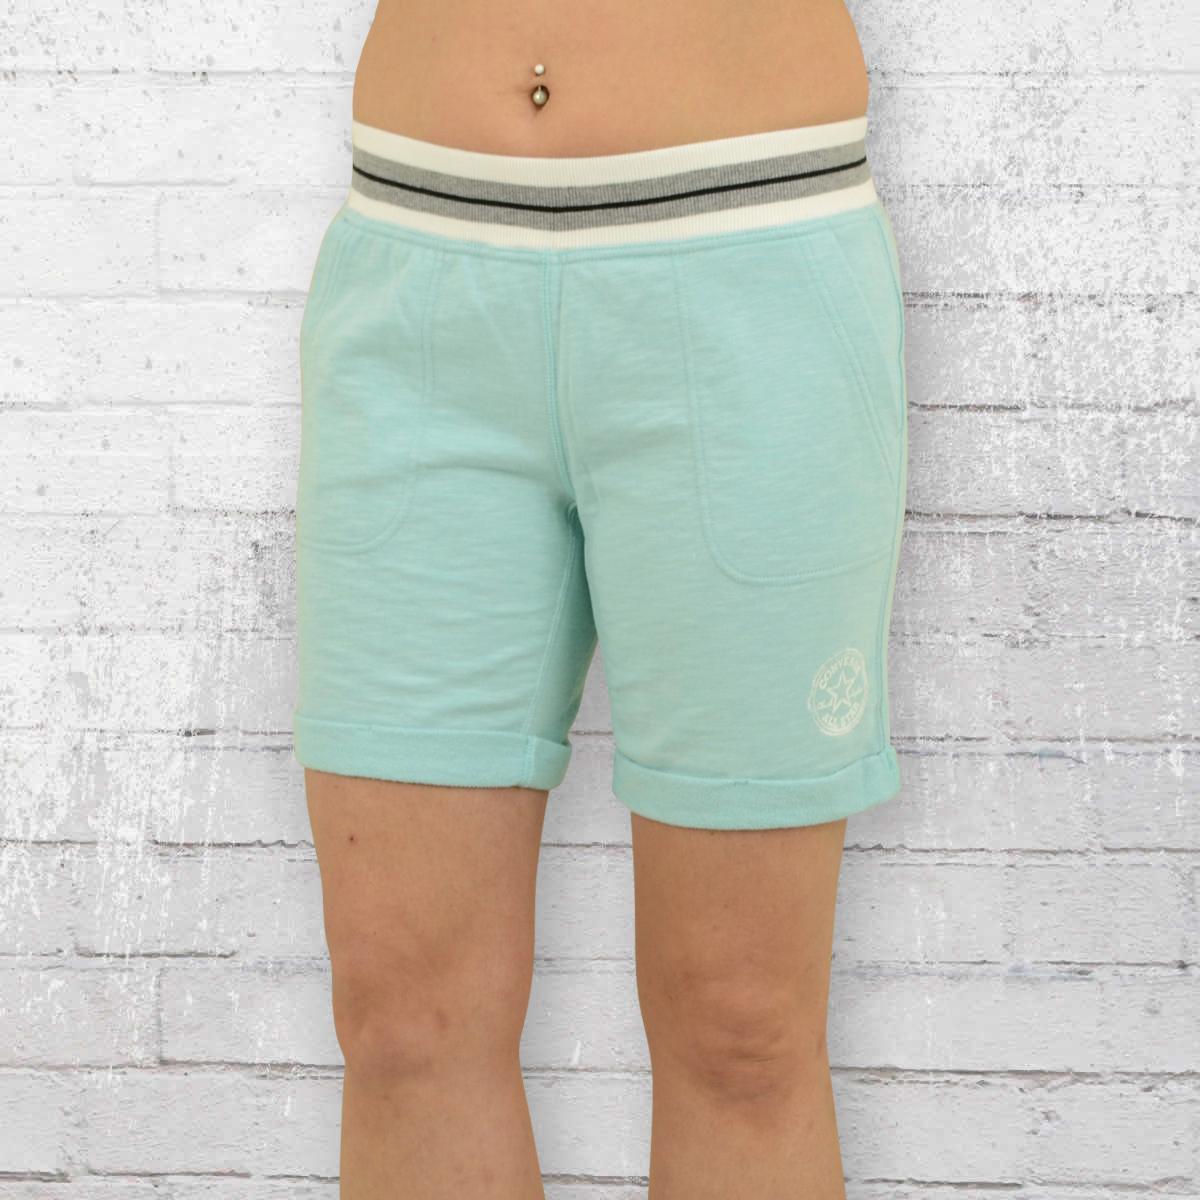 converse blue shorts